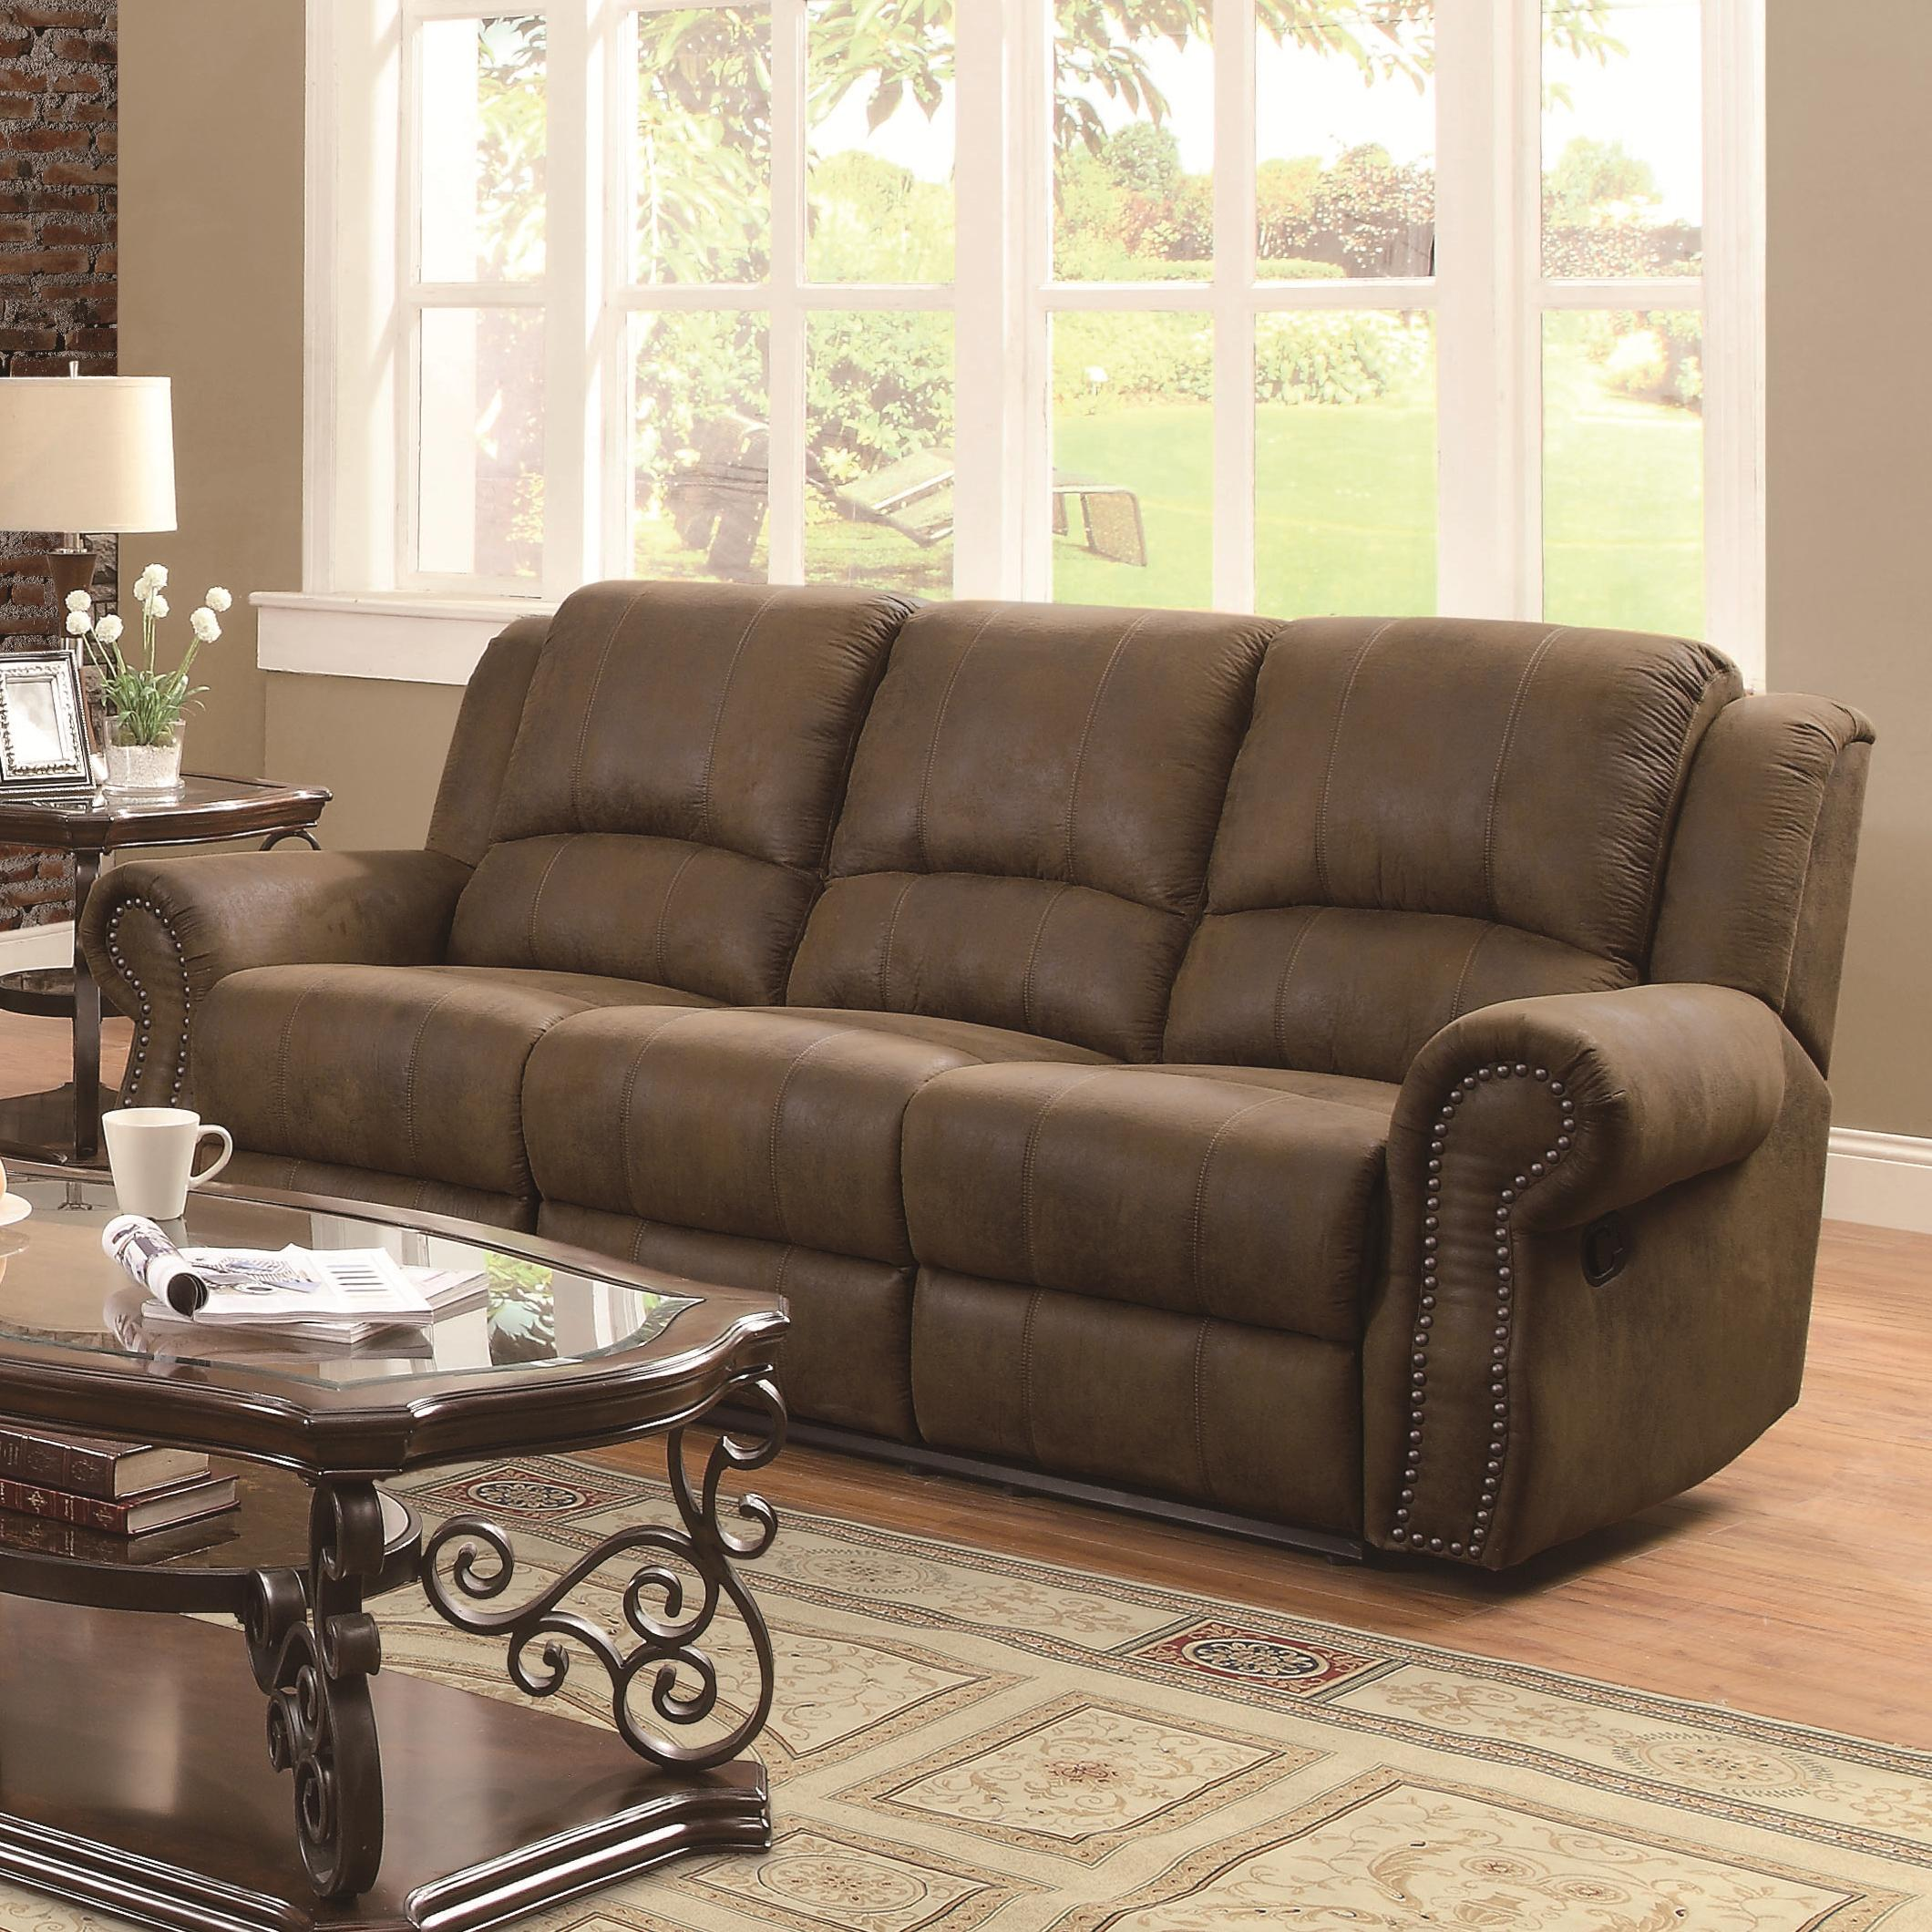 Sir Rawlinson Motion Sofa by Coaster at Value City Furniture